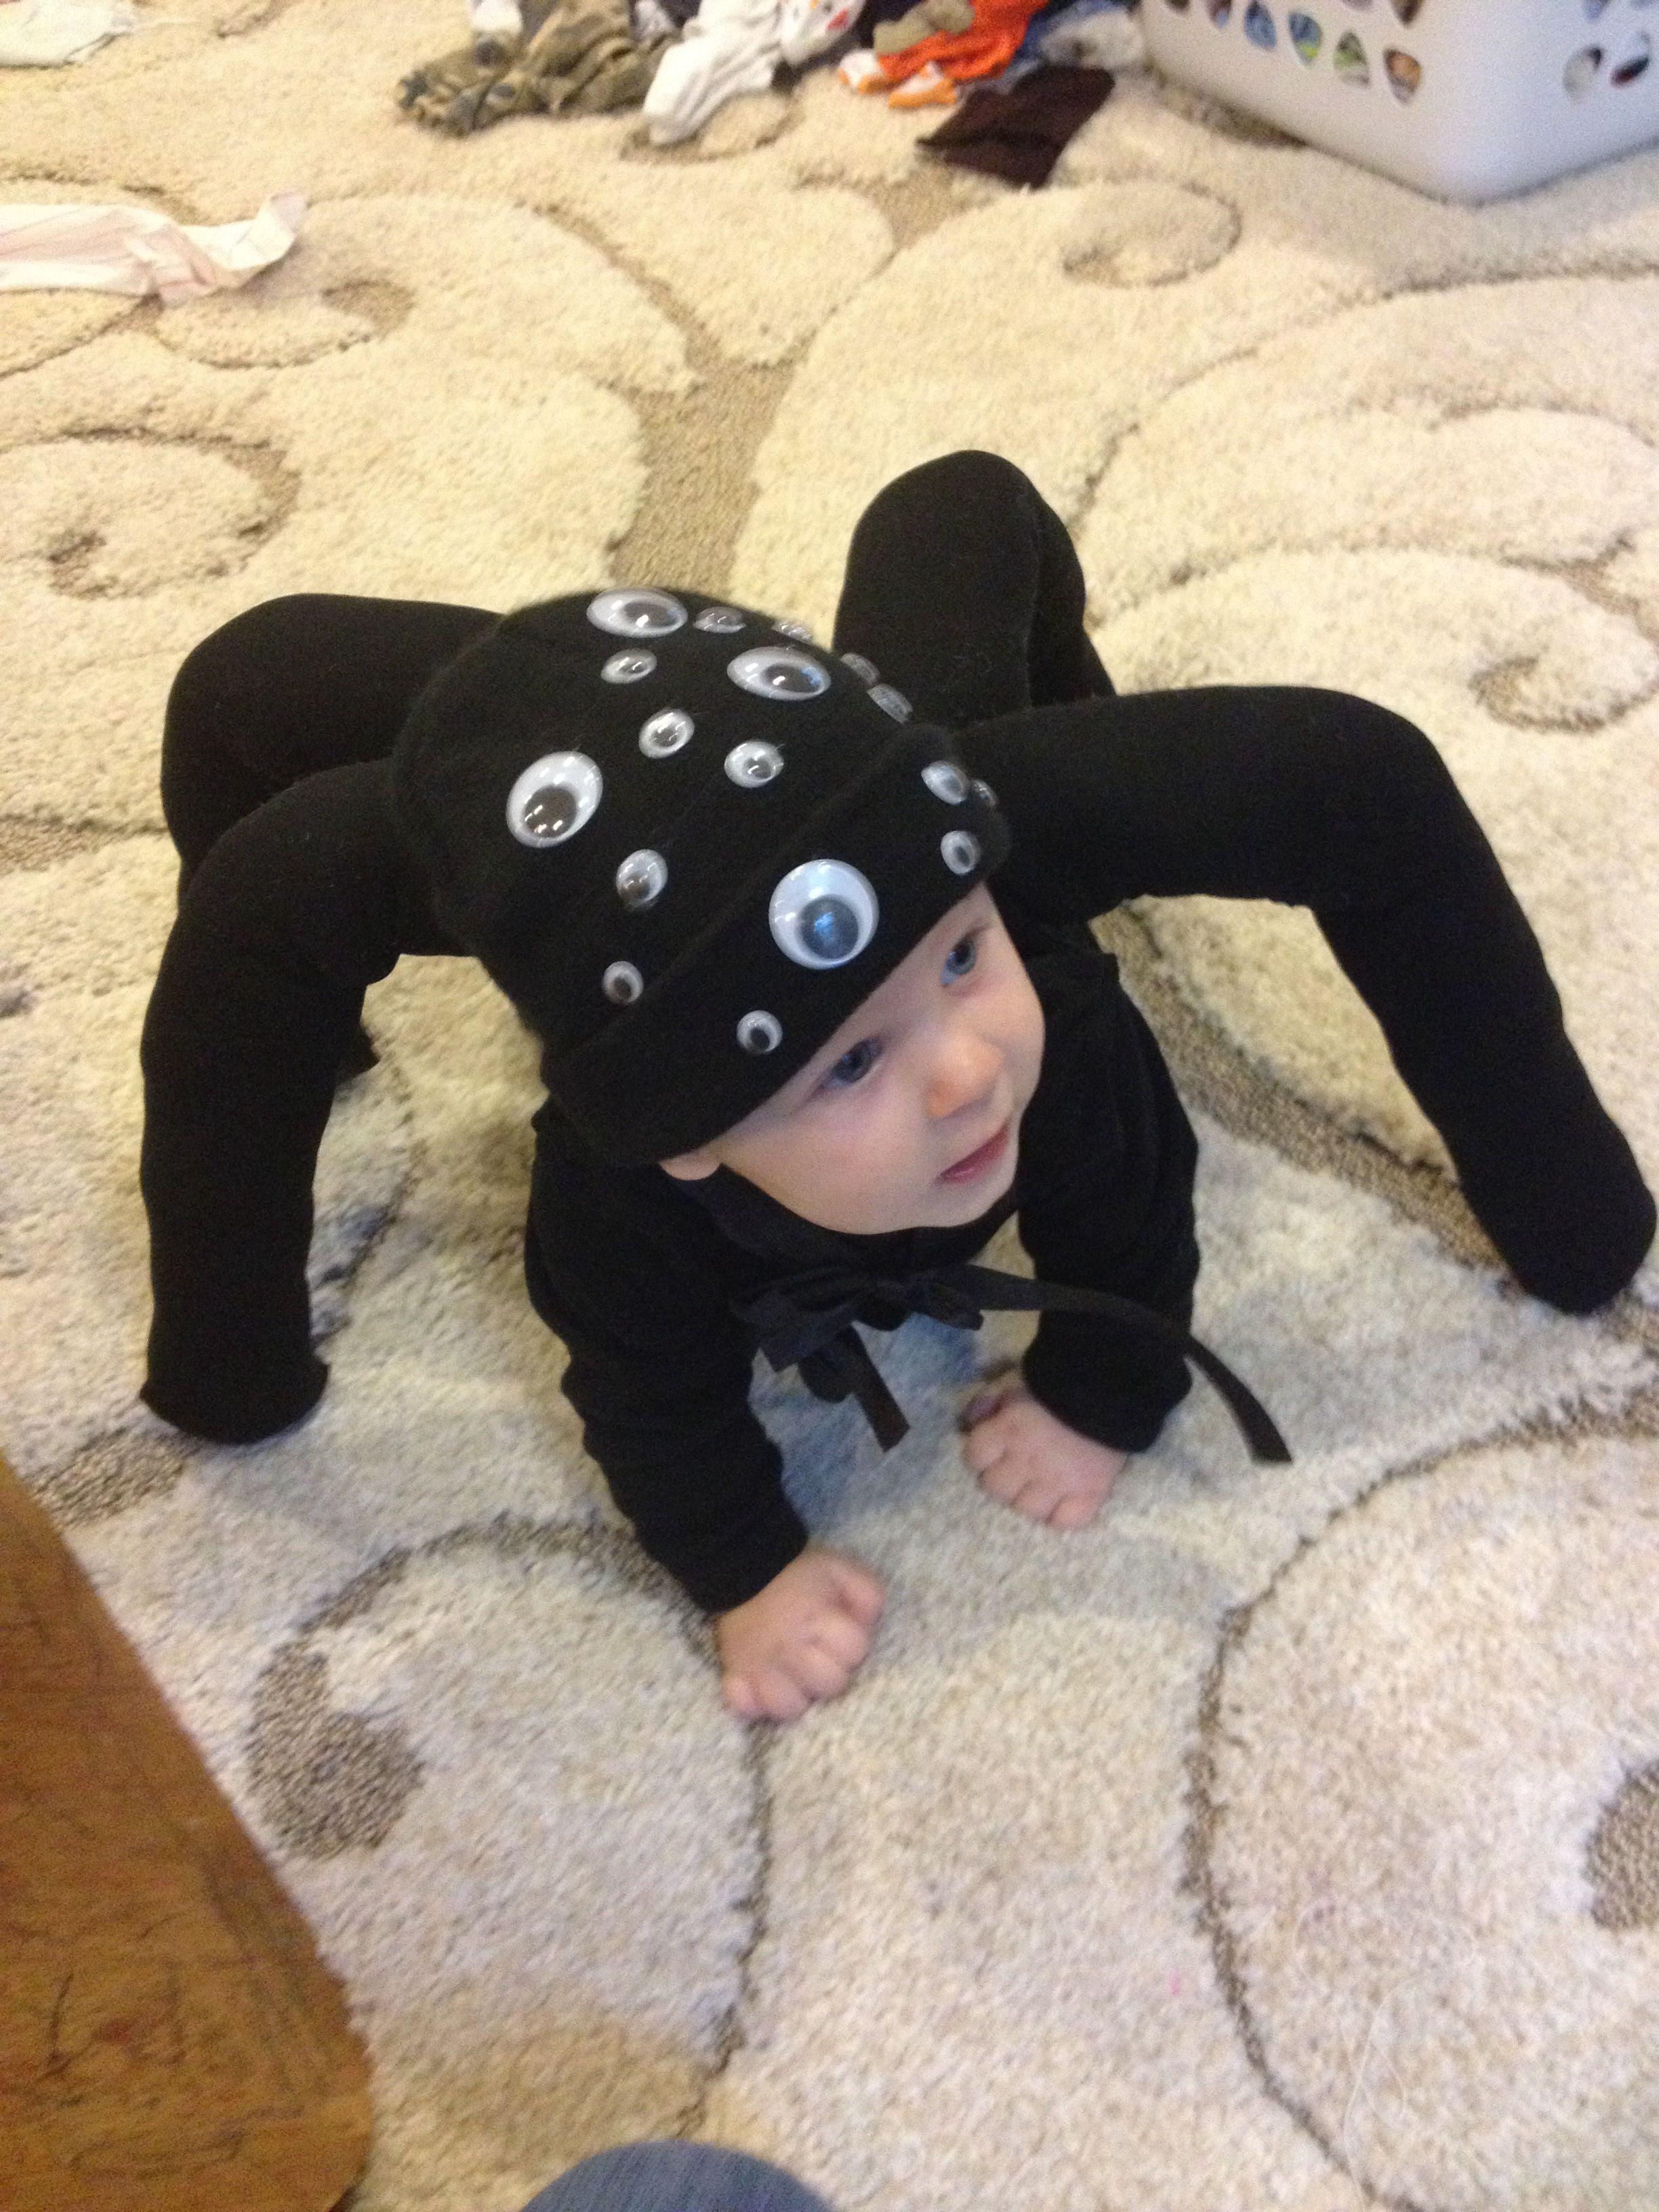 Spider Halloween costume for baby. #funnyhalloweencostumes